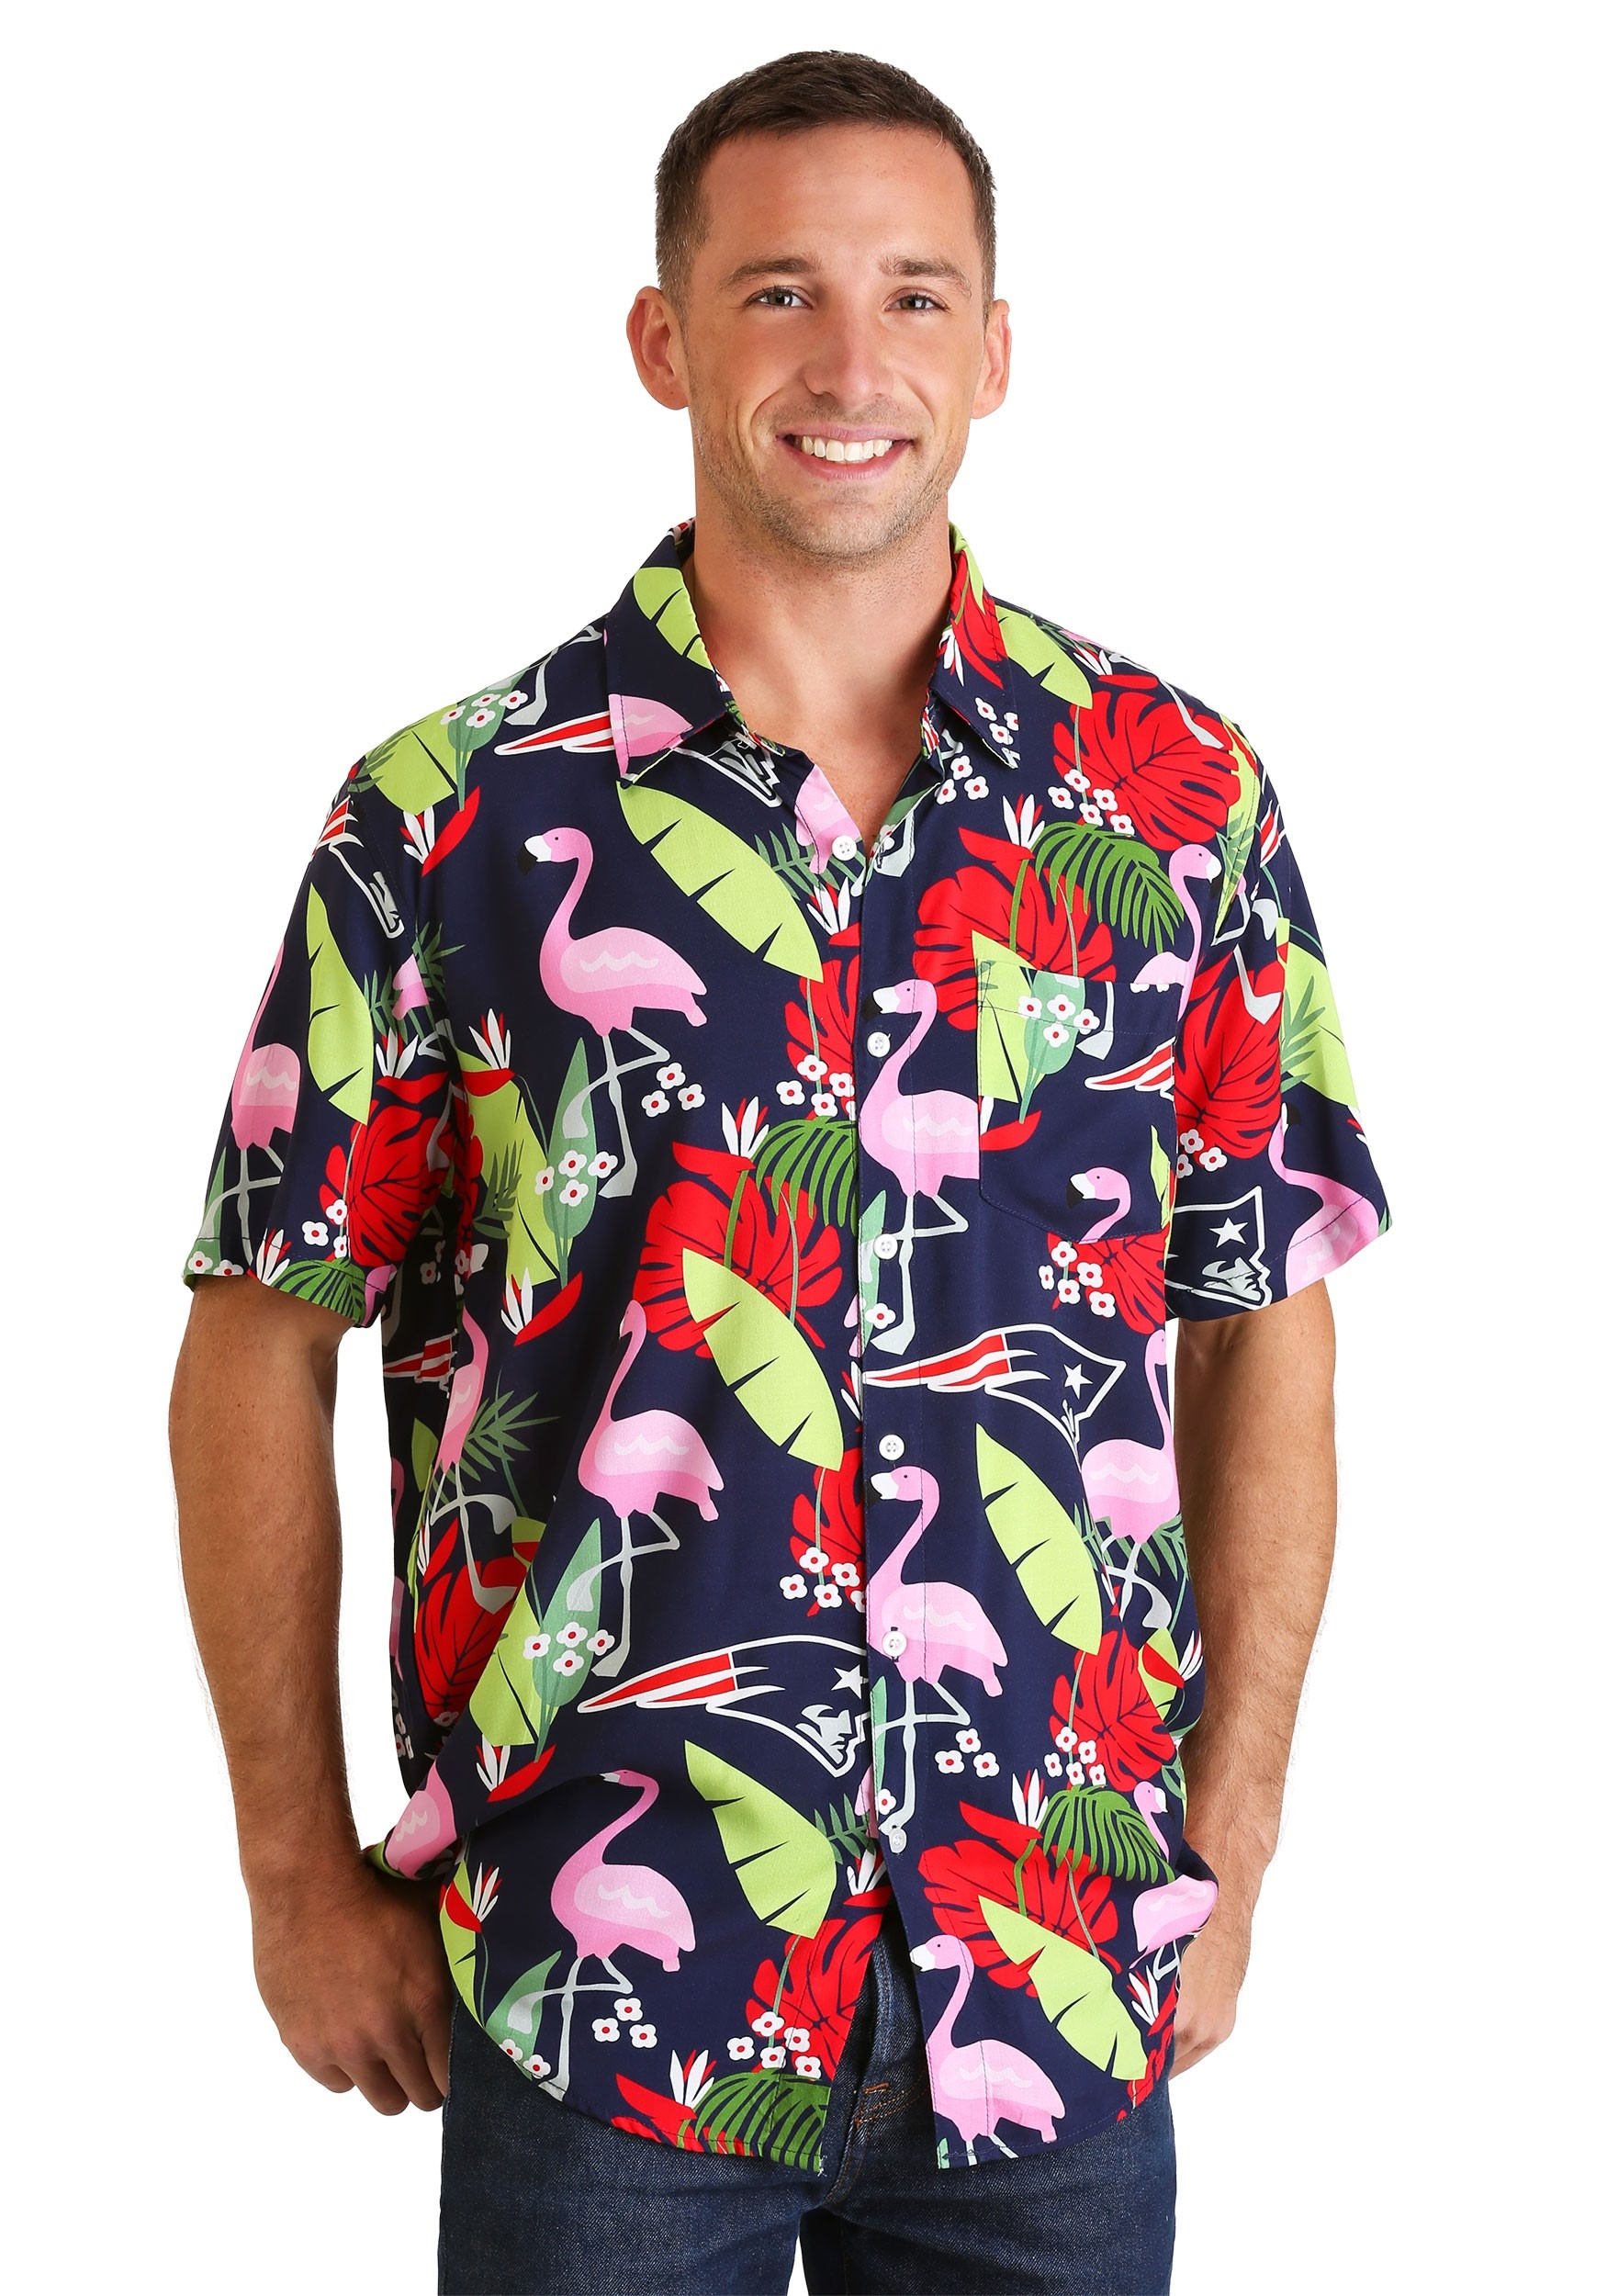 New England Patriots Floral Shirt for Men